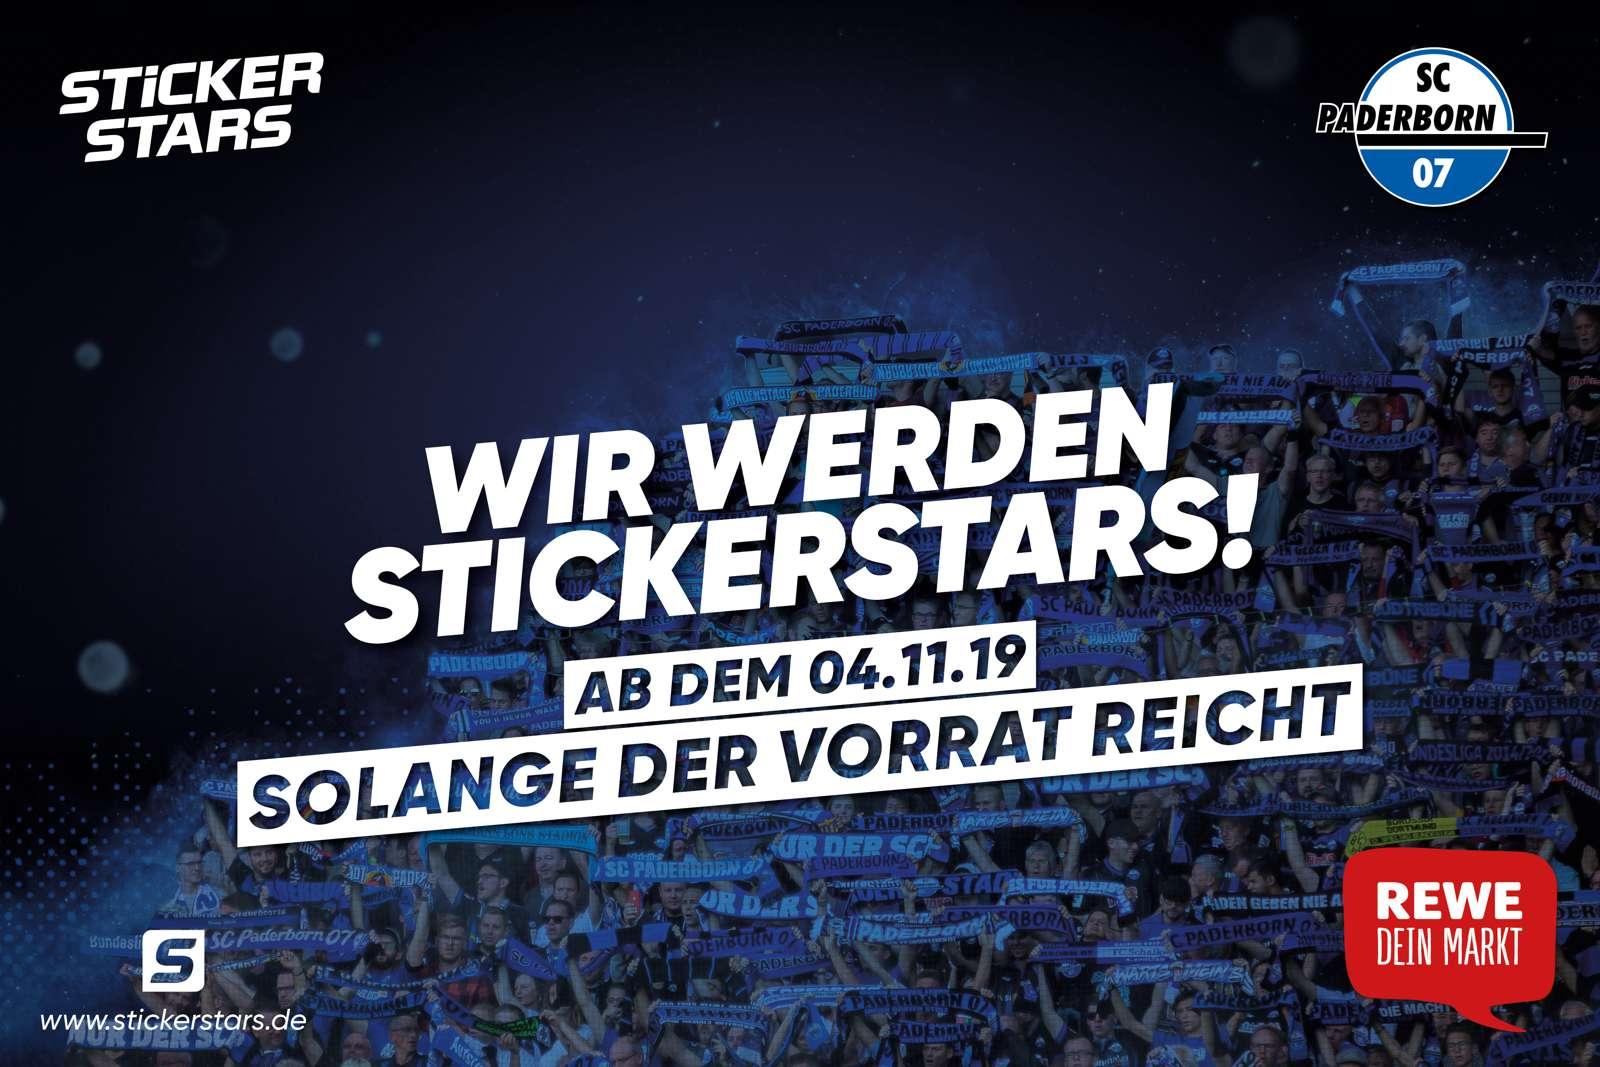 SC Paderborn erhält eigenes Vereins-Sammelalbum